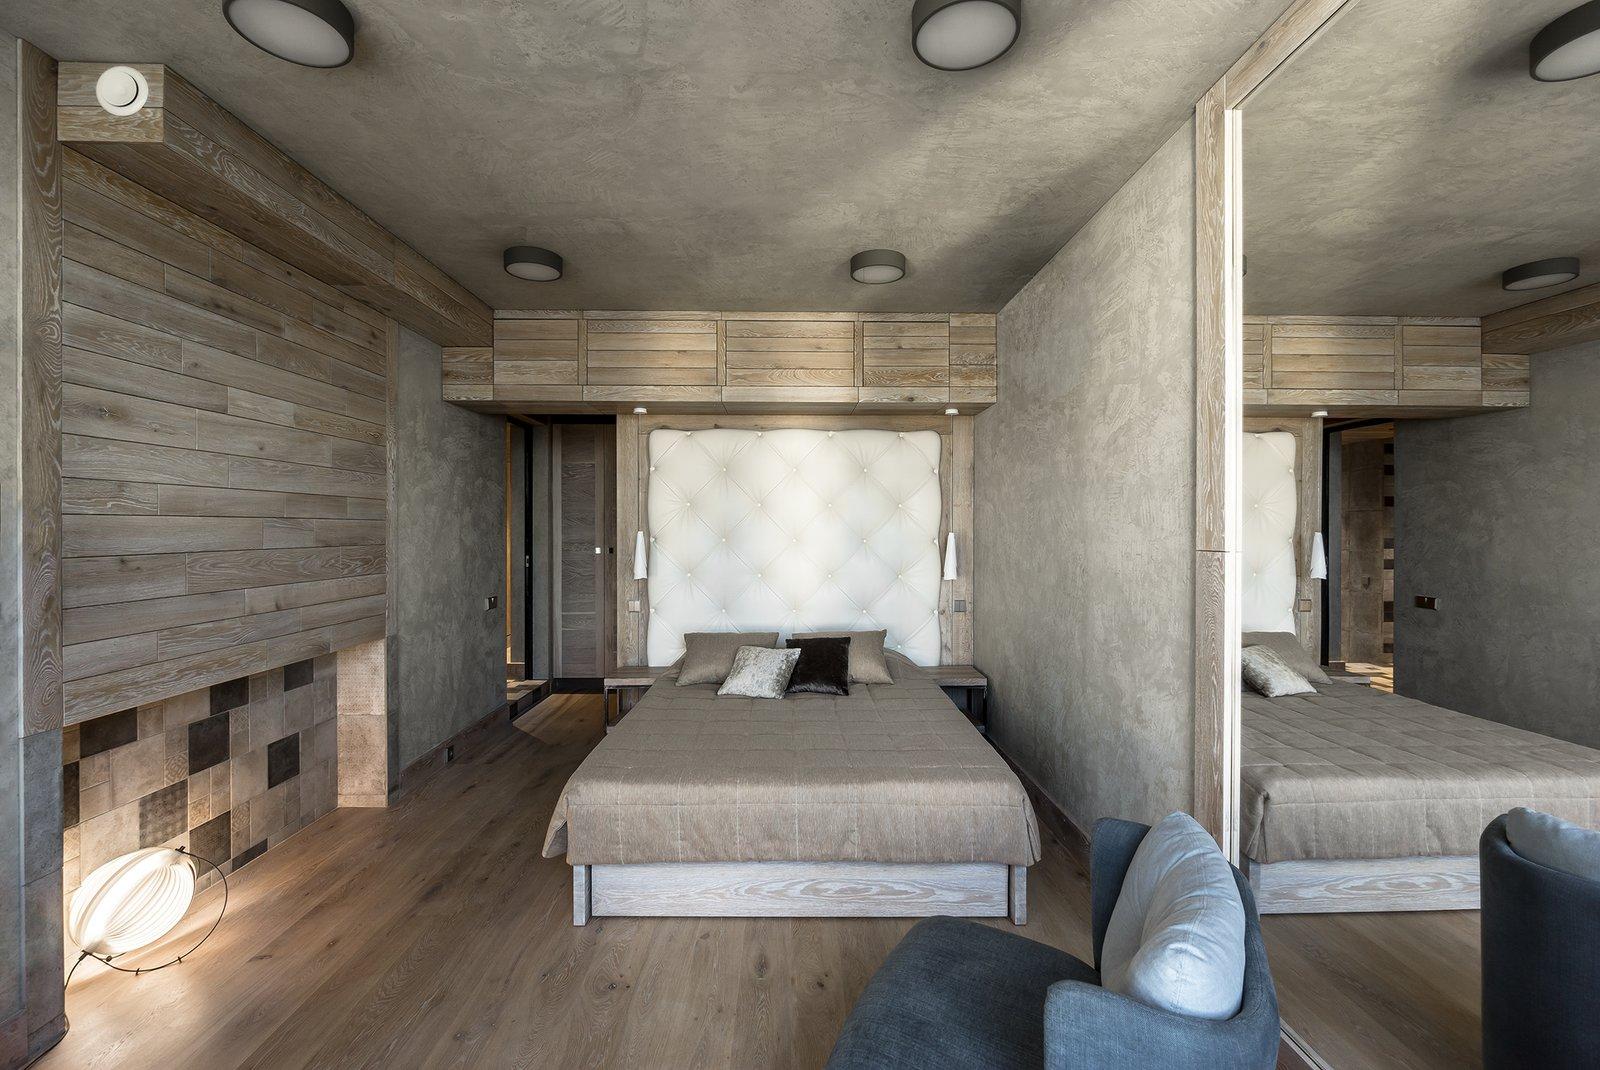 Bedroom, Night Stands, Bed, Chair, Ceiling Lighting, Floor Lighting, Pendant Lighting, and Medium Hardwood Floor Bedroom  NagatinSky by Alexey Rozenberg